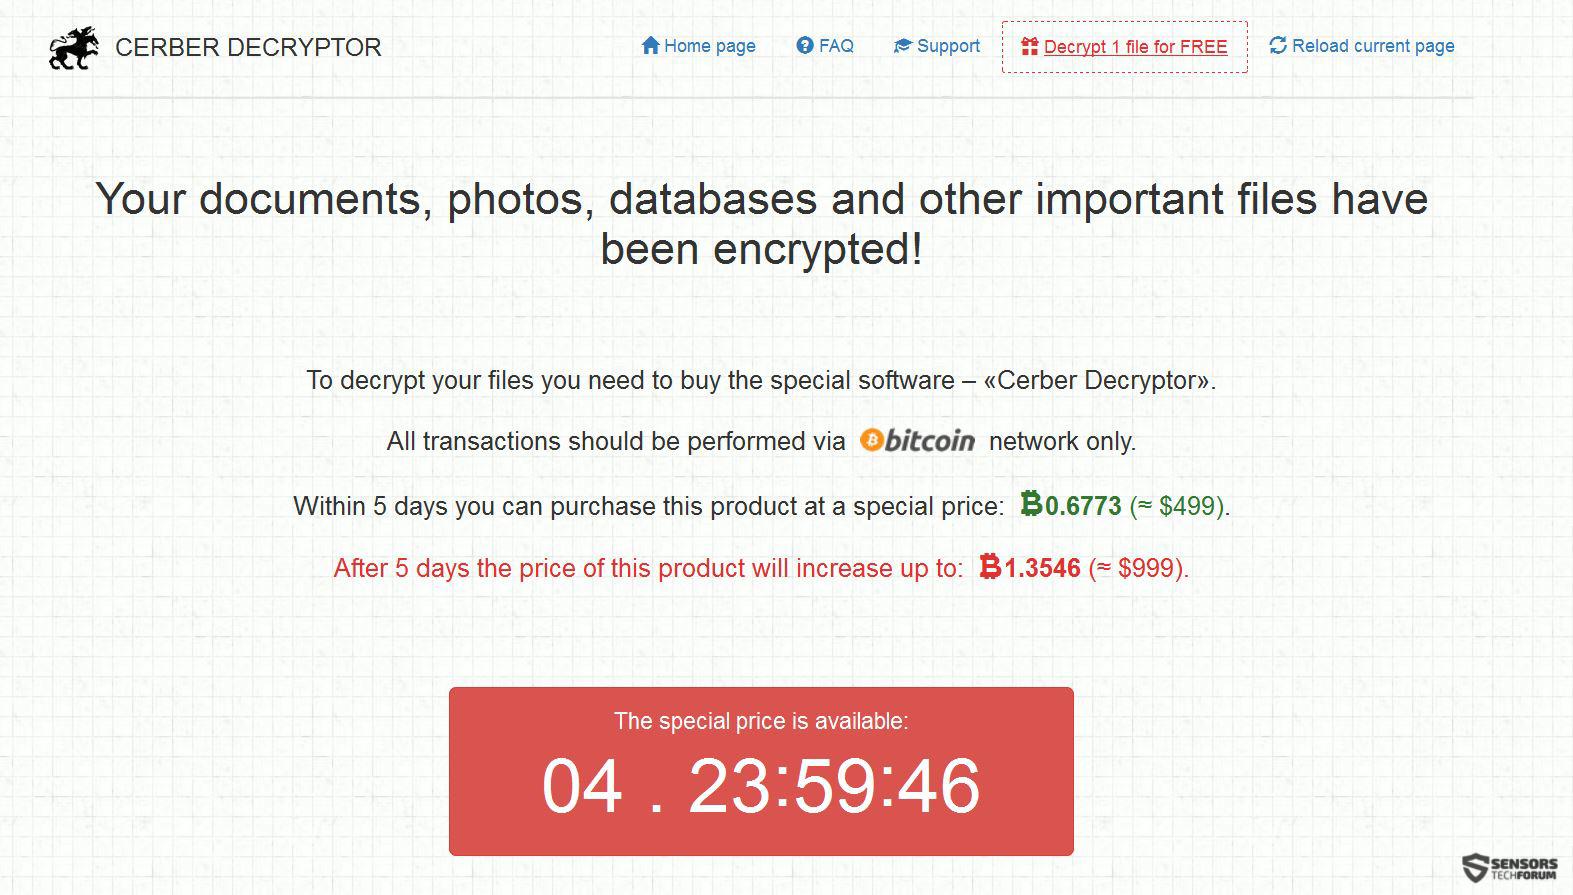 sensorstechforum-cerber-4-1-6-ransomware-payment-page